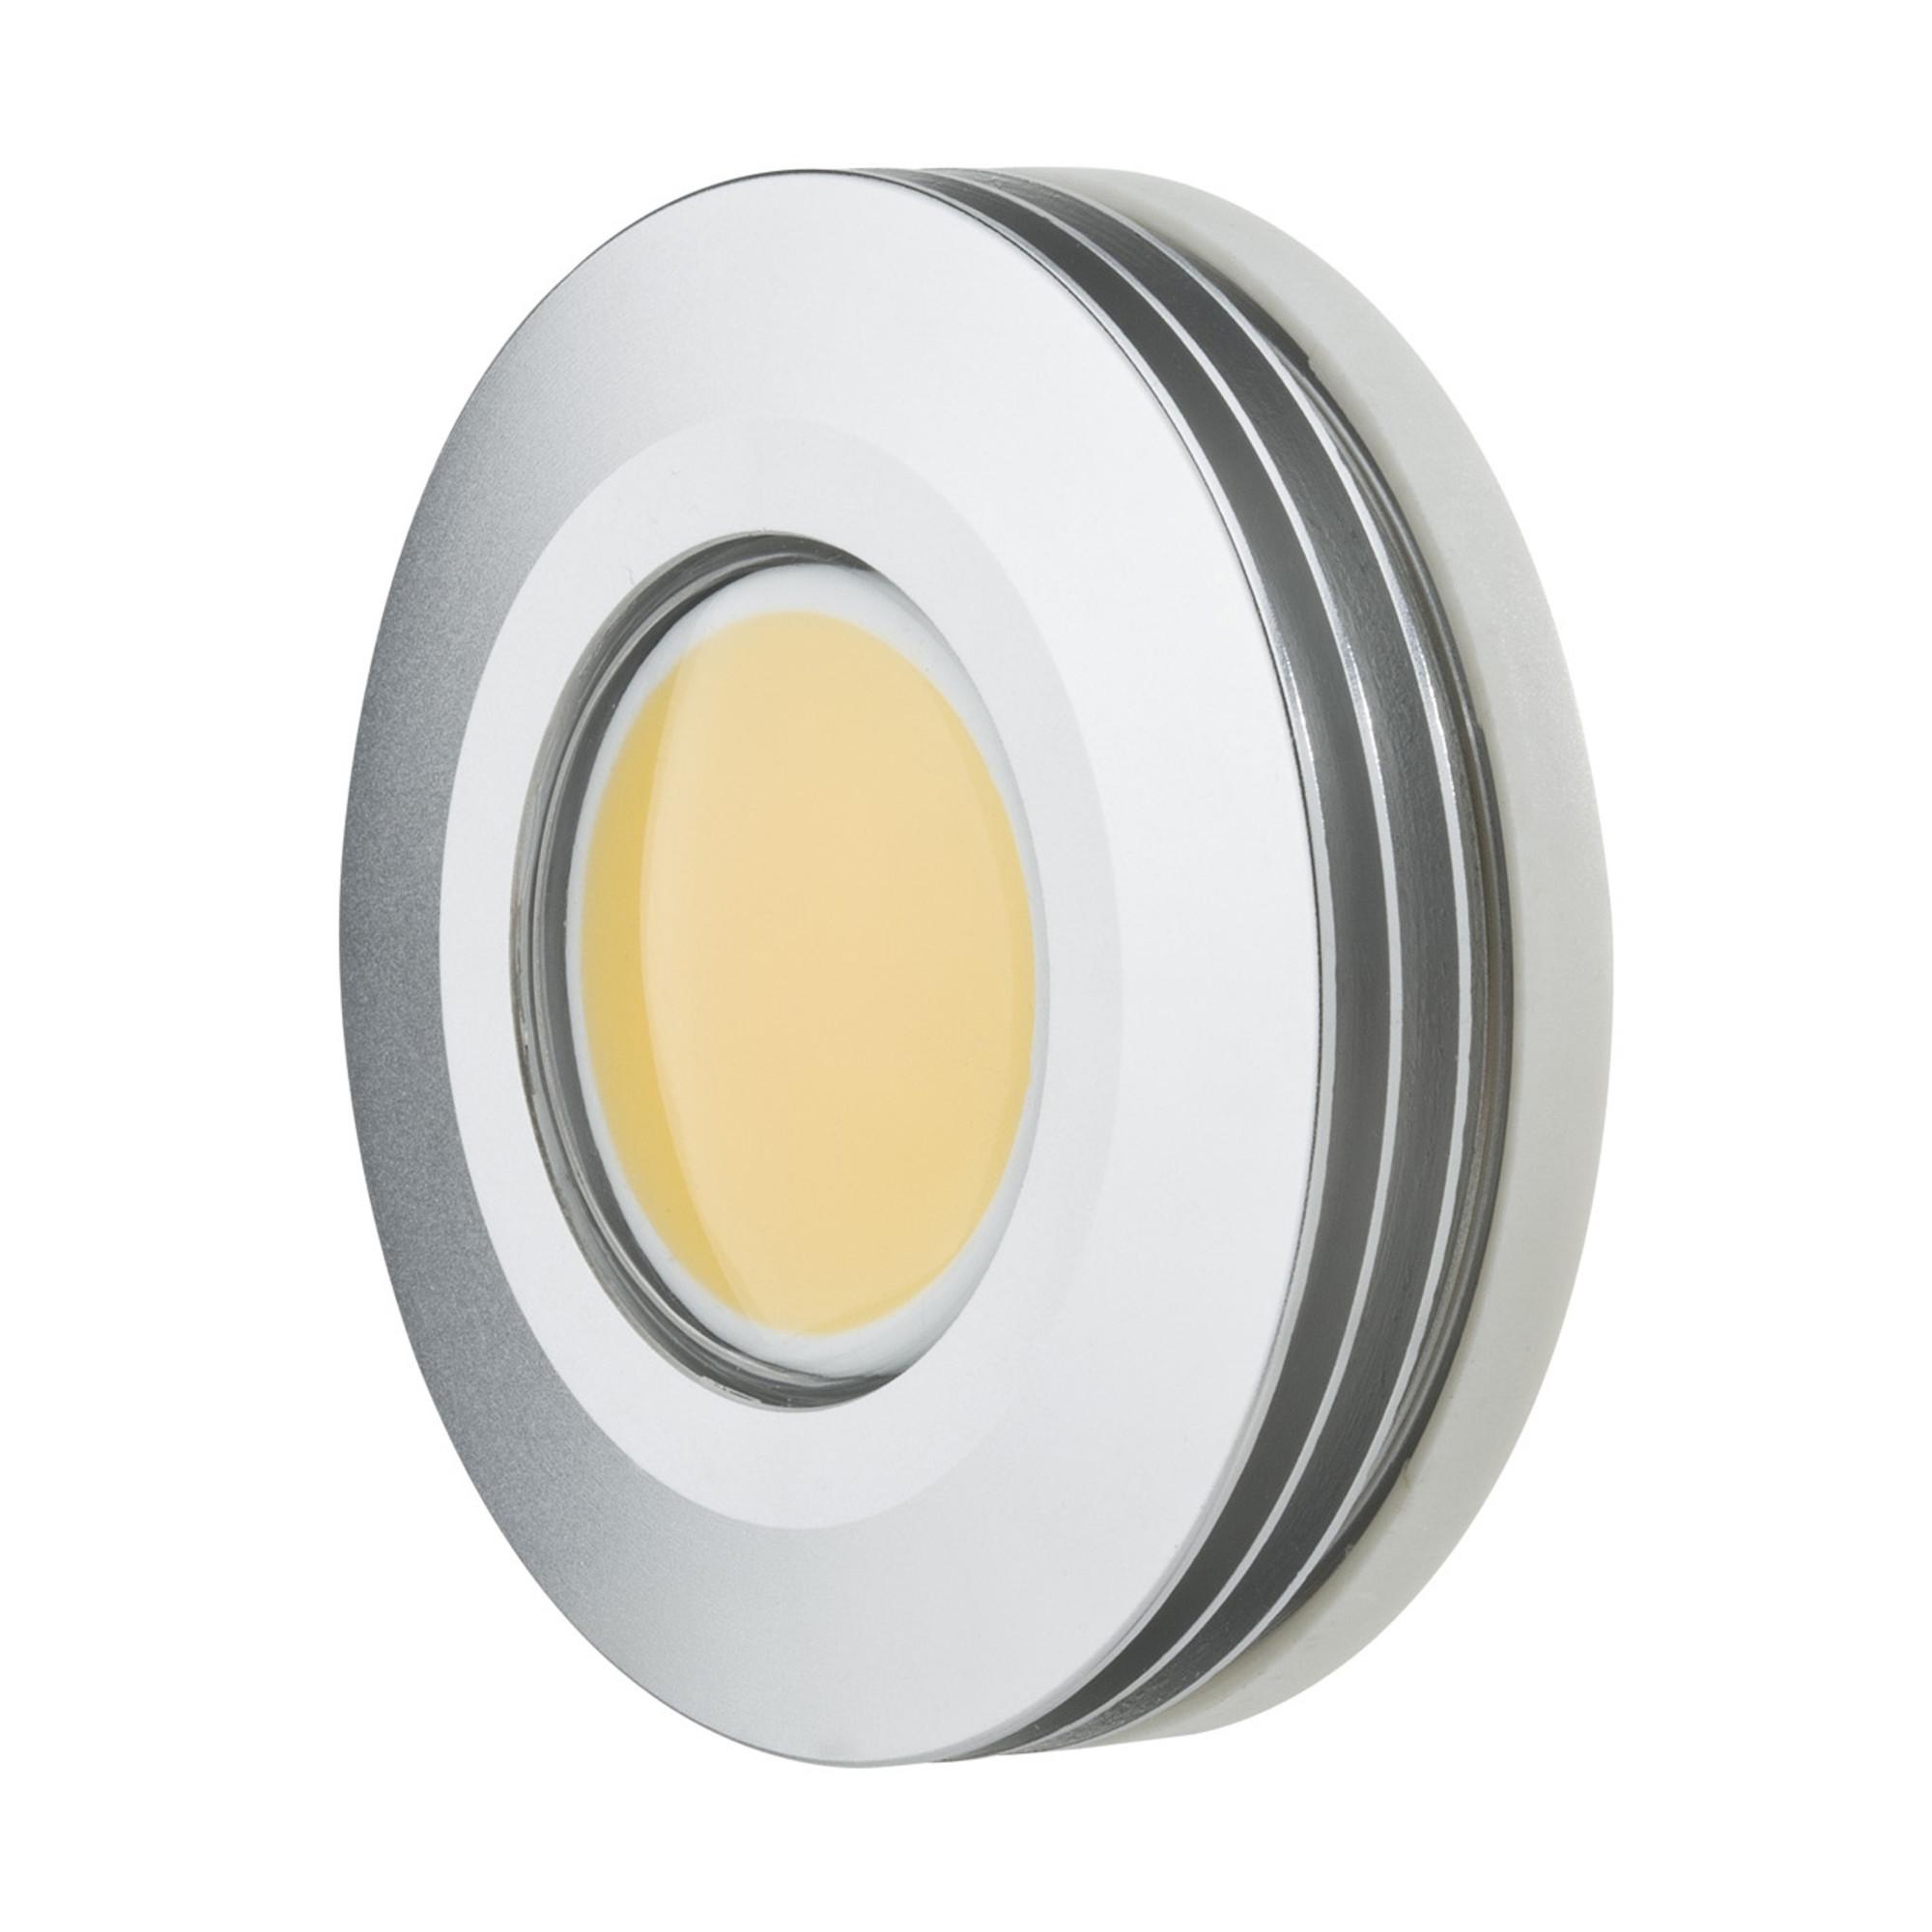 Лампа светодиодная Paulmann 28133 GX53 350 Лм теплый свет